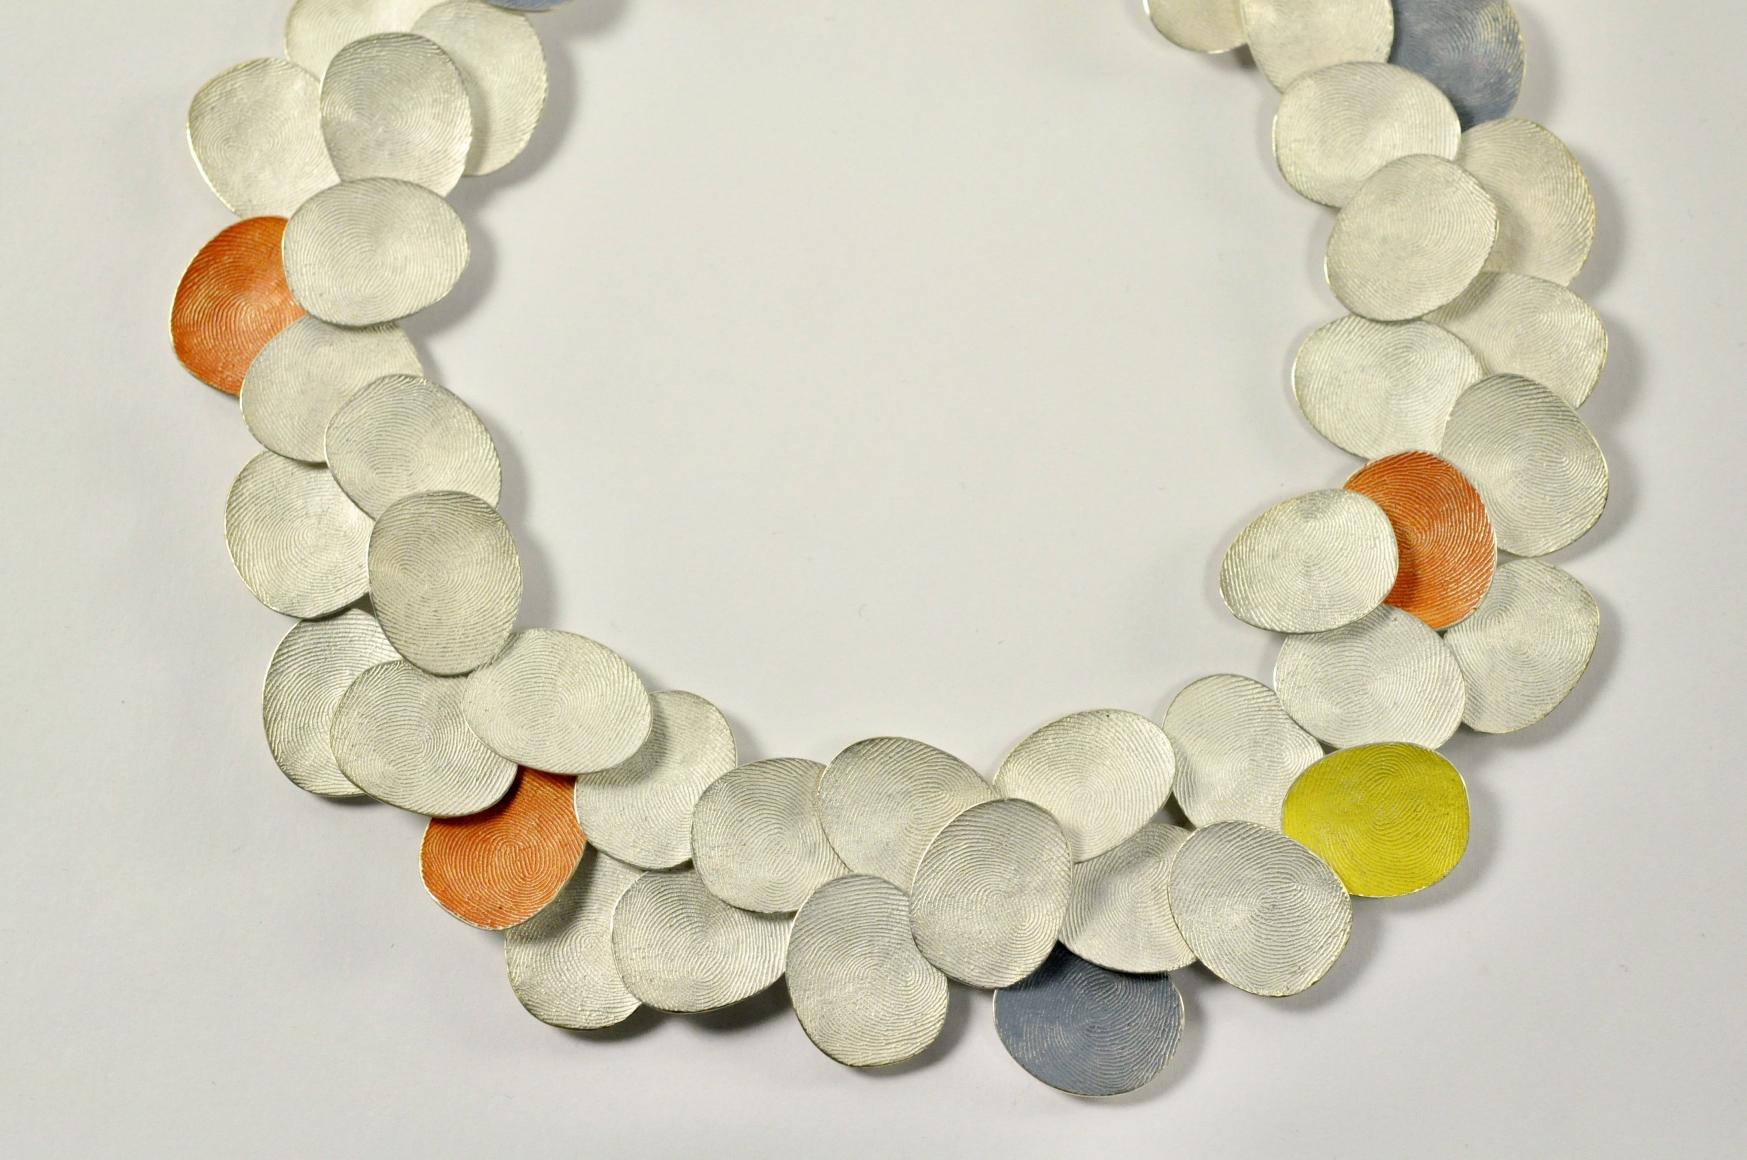 Gerd Rothmann, Wolkengestrüpp, halssieraad, 2021, zilver, pigment